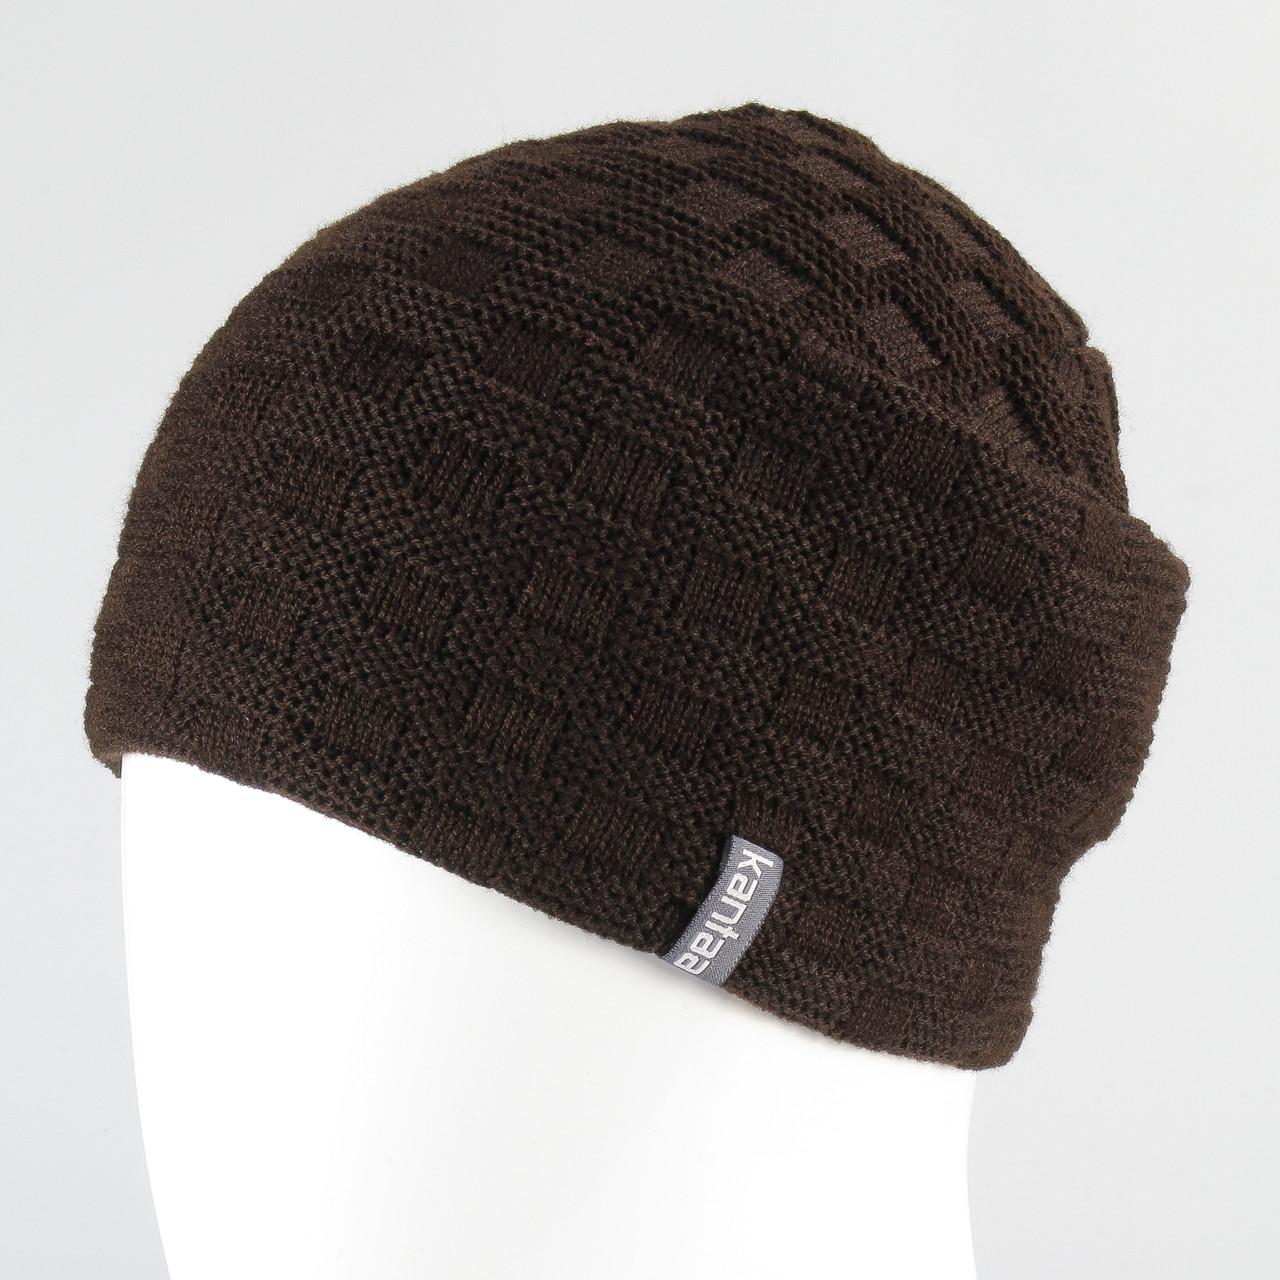 Вязанная шапка унисекс KANTAA коричневый